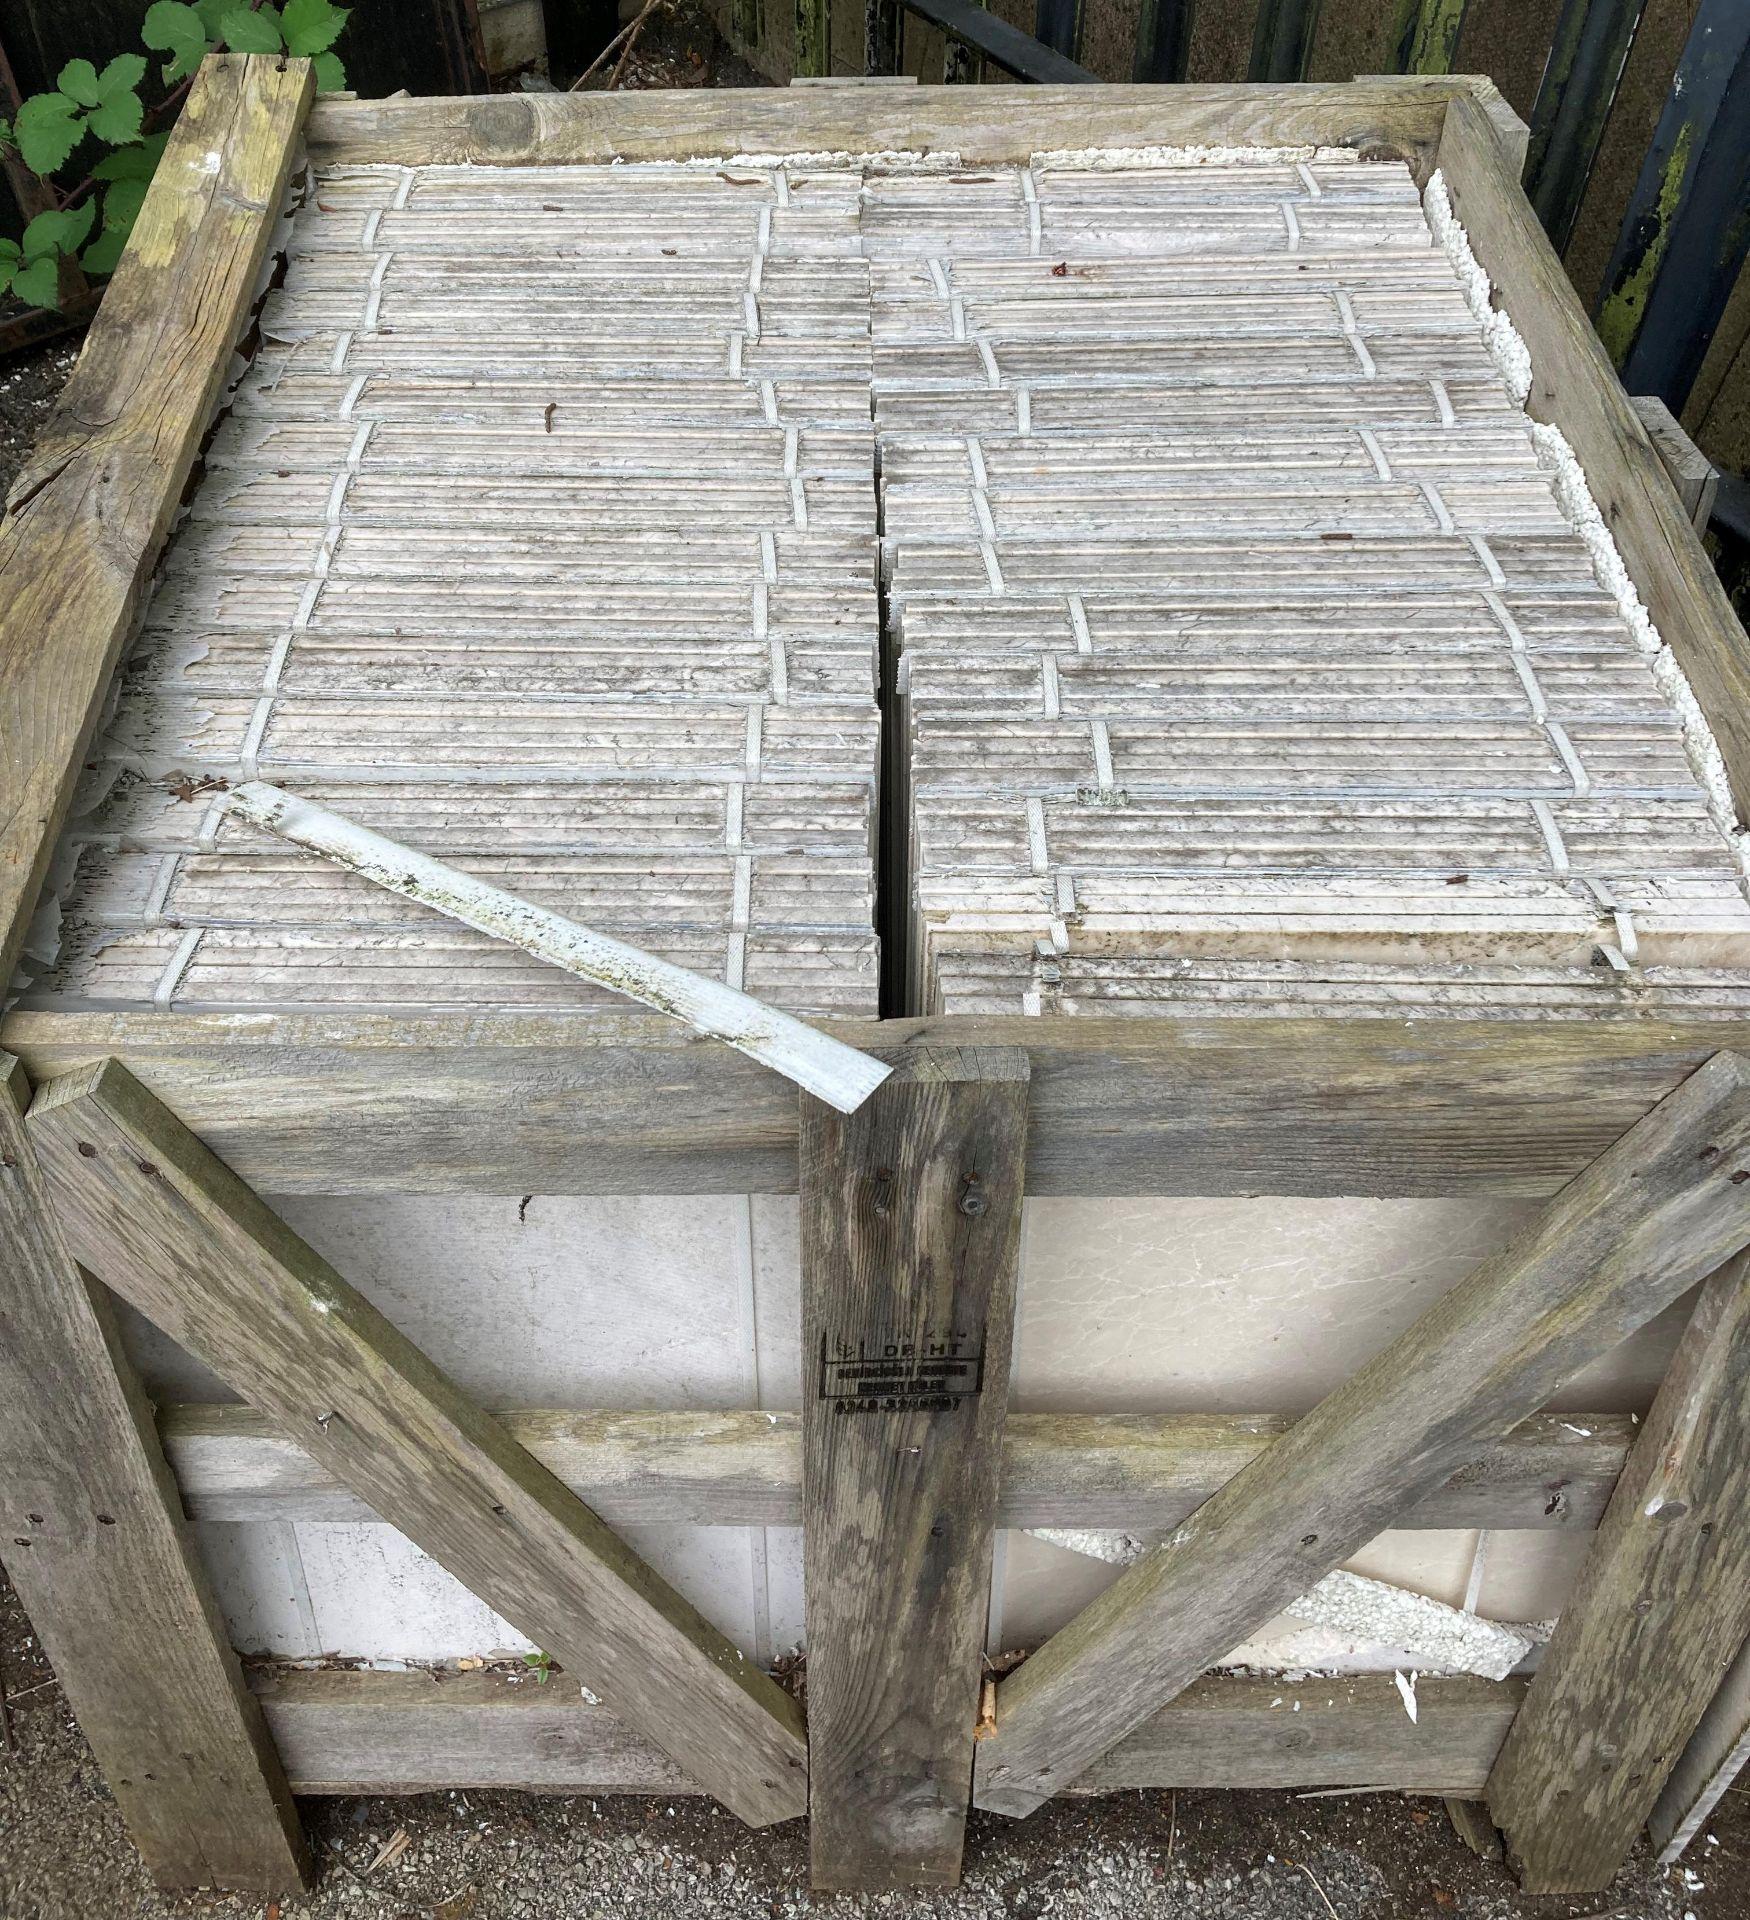 30 x packs of 4 marble tiles in Rosoni beige - 600 x 400 x 1. - Image 2 of 2